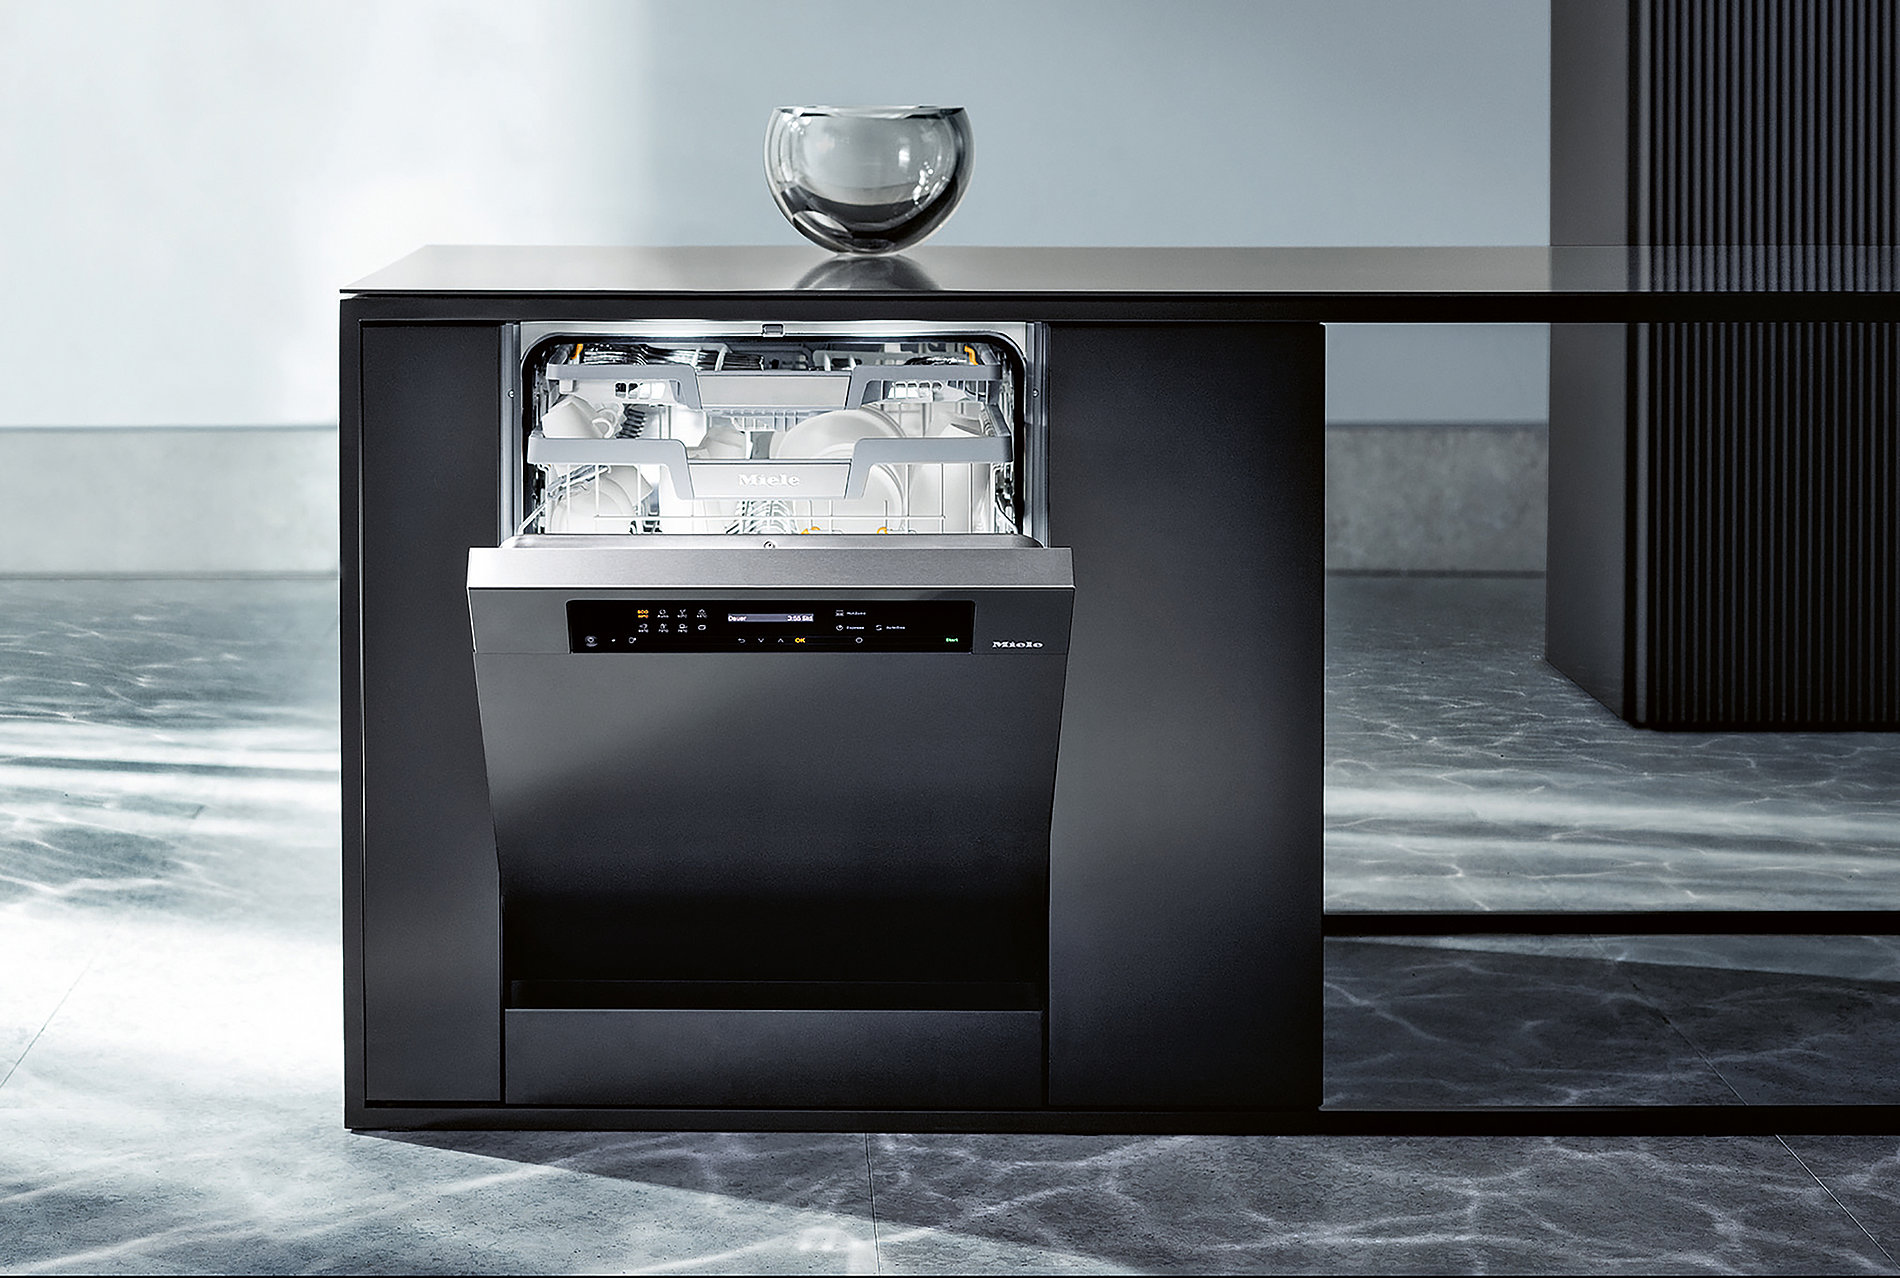 G7000 Series Semi-Integrated (G7915 SCi) | Red Dot Design Award